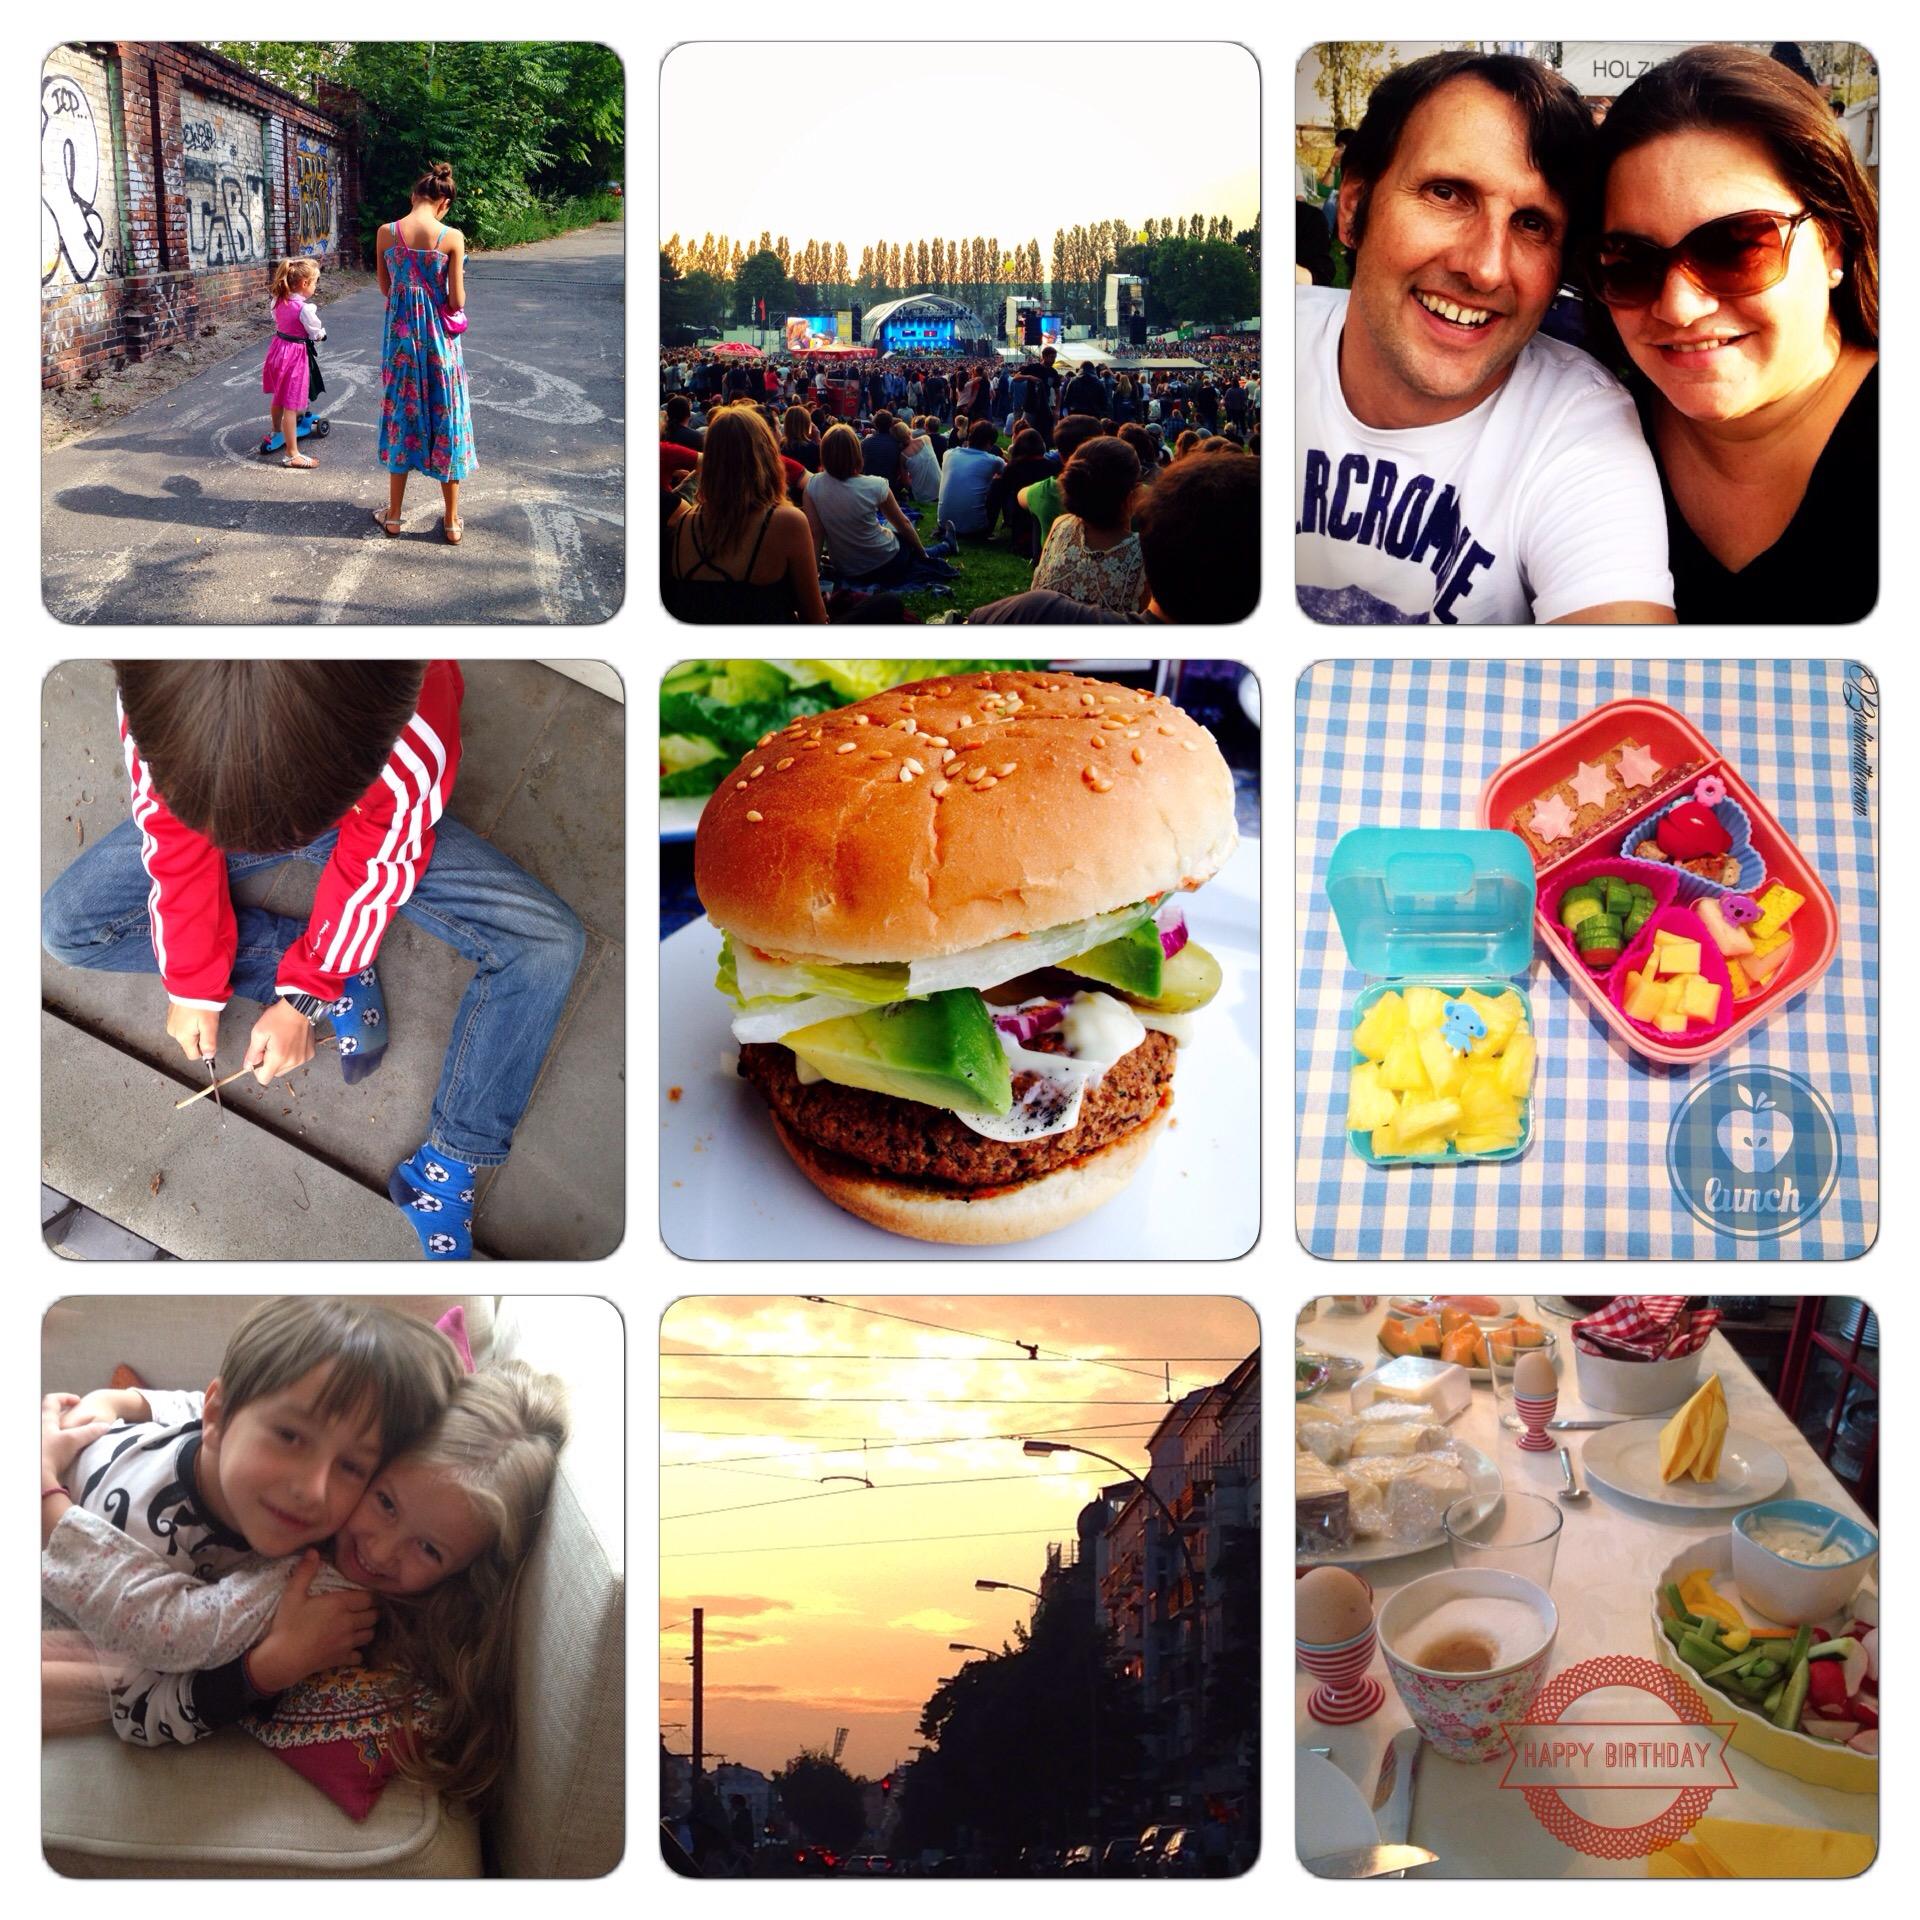 Monatsrückblick im September, Monat in Bildern, Fotos des Monats, Instagram, Instaframe